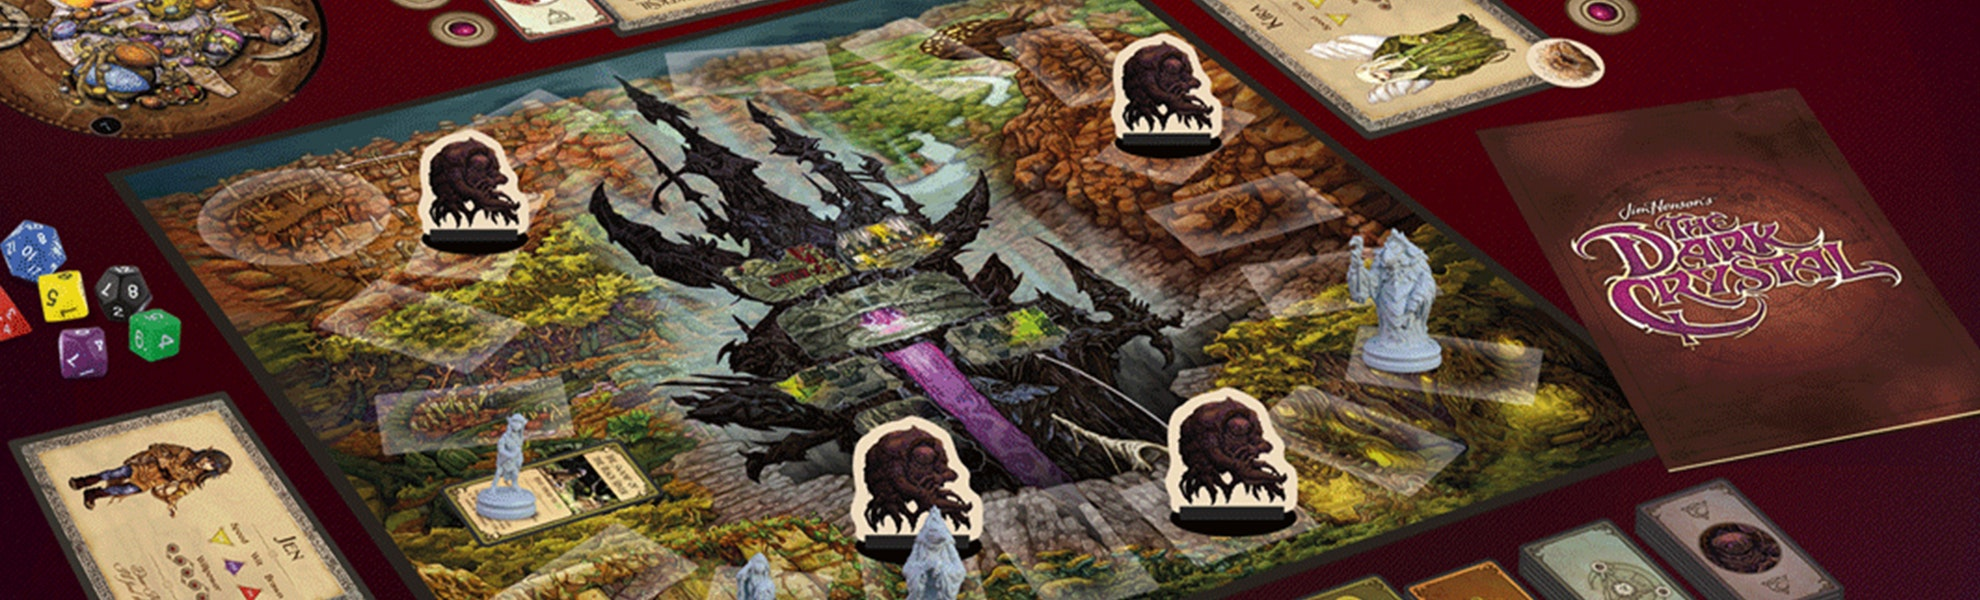 Jim Henson's The Dark Crystal Board Game Preorder